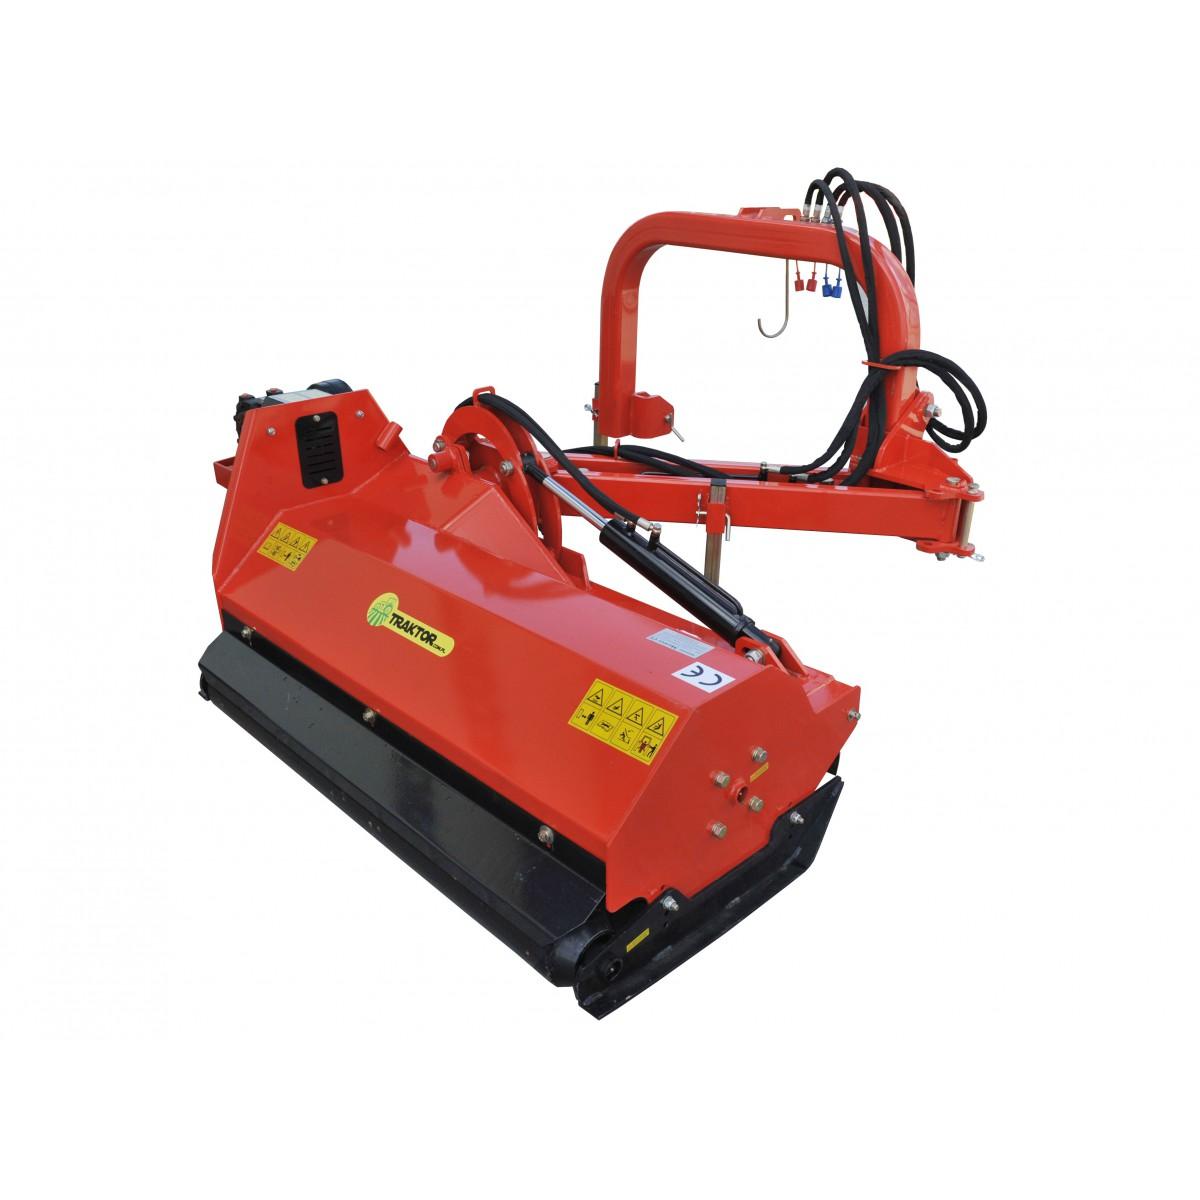 AGH 220 REAR-SIDE Flail Mower